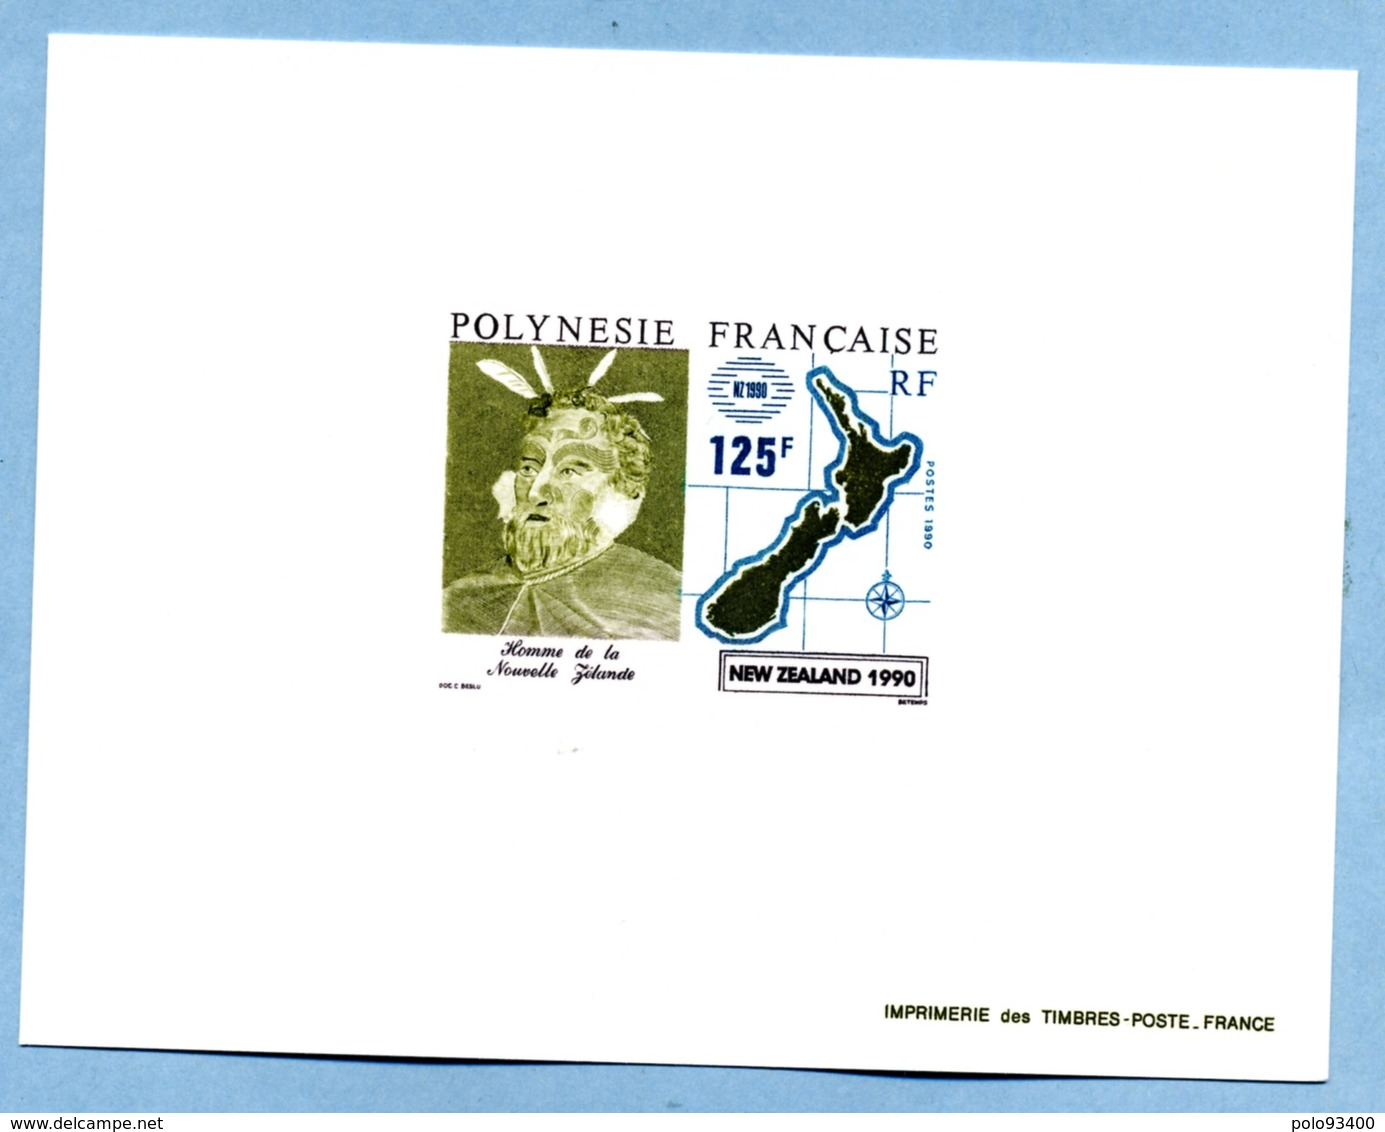 24-08-1990 ÉPREUVE DU 125 F - Polinesia Francesa